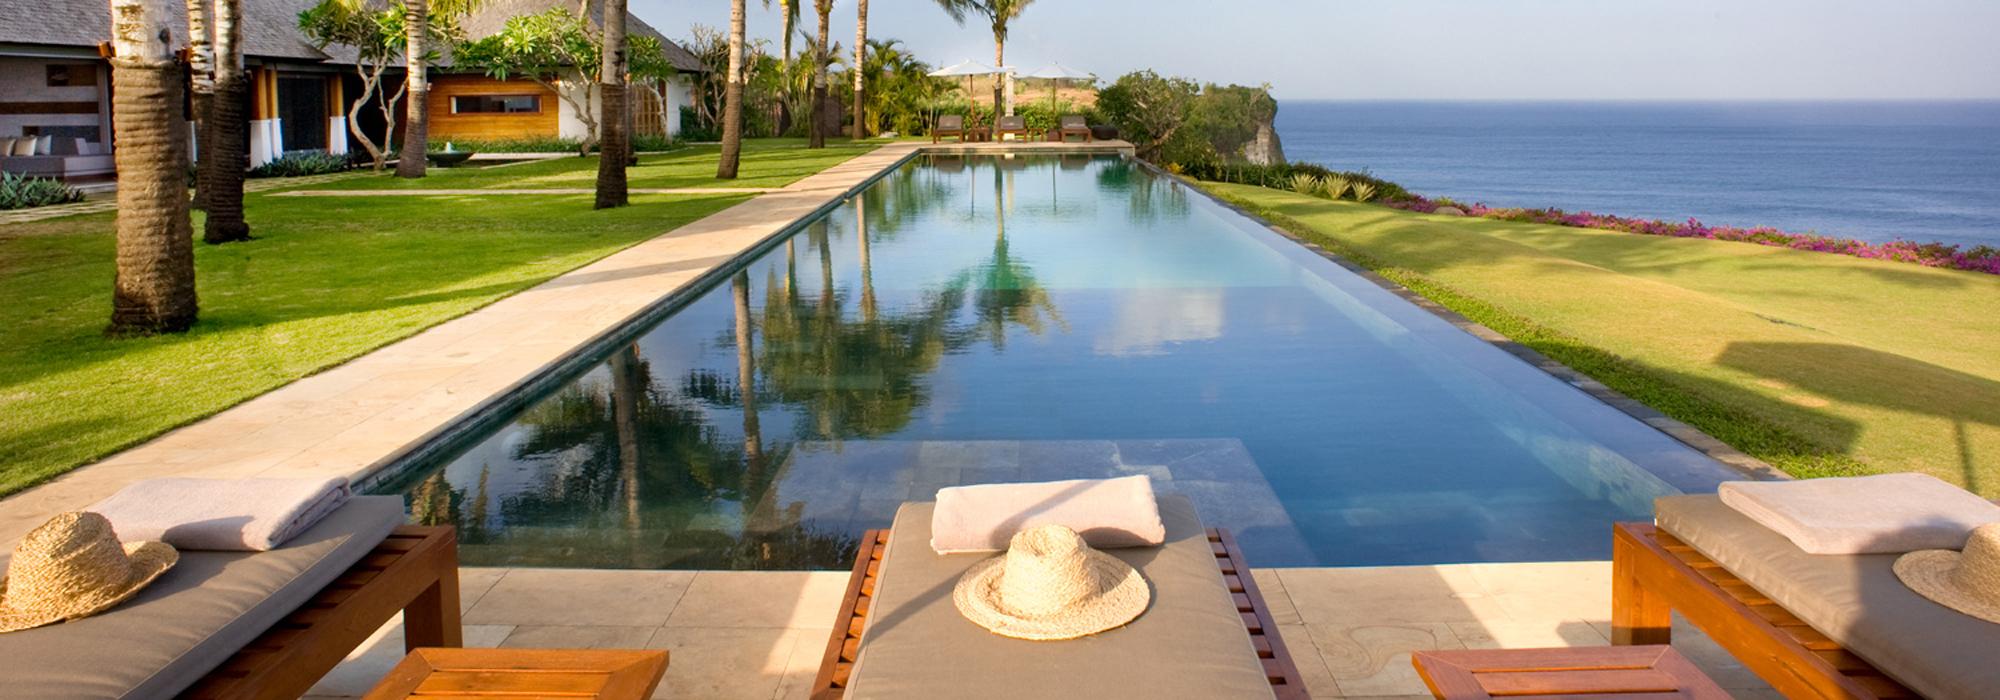 Uluwatu 5 Bedroom Luxury Villa